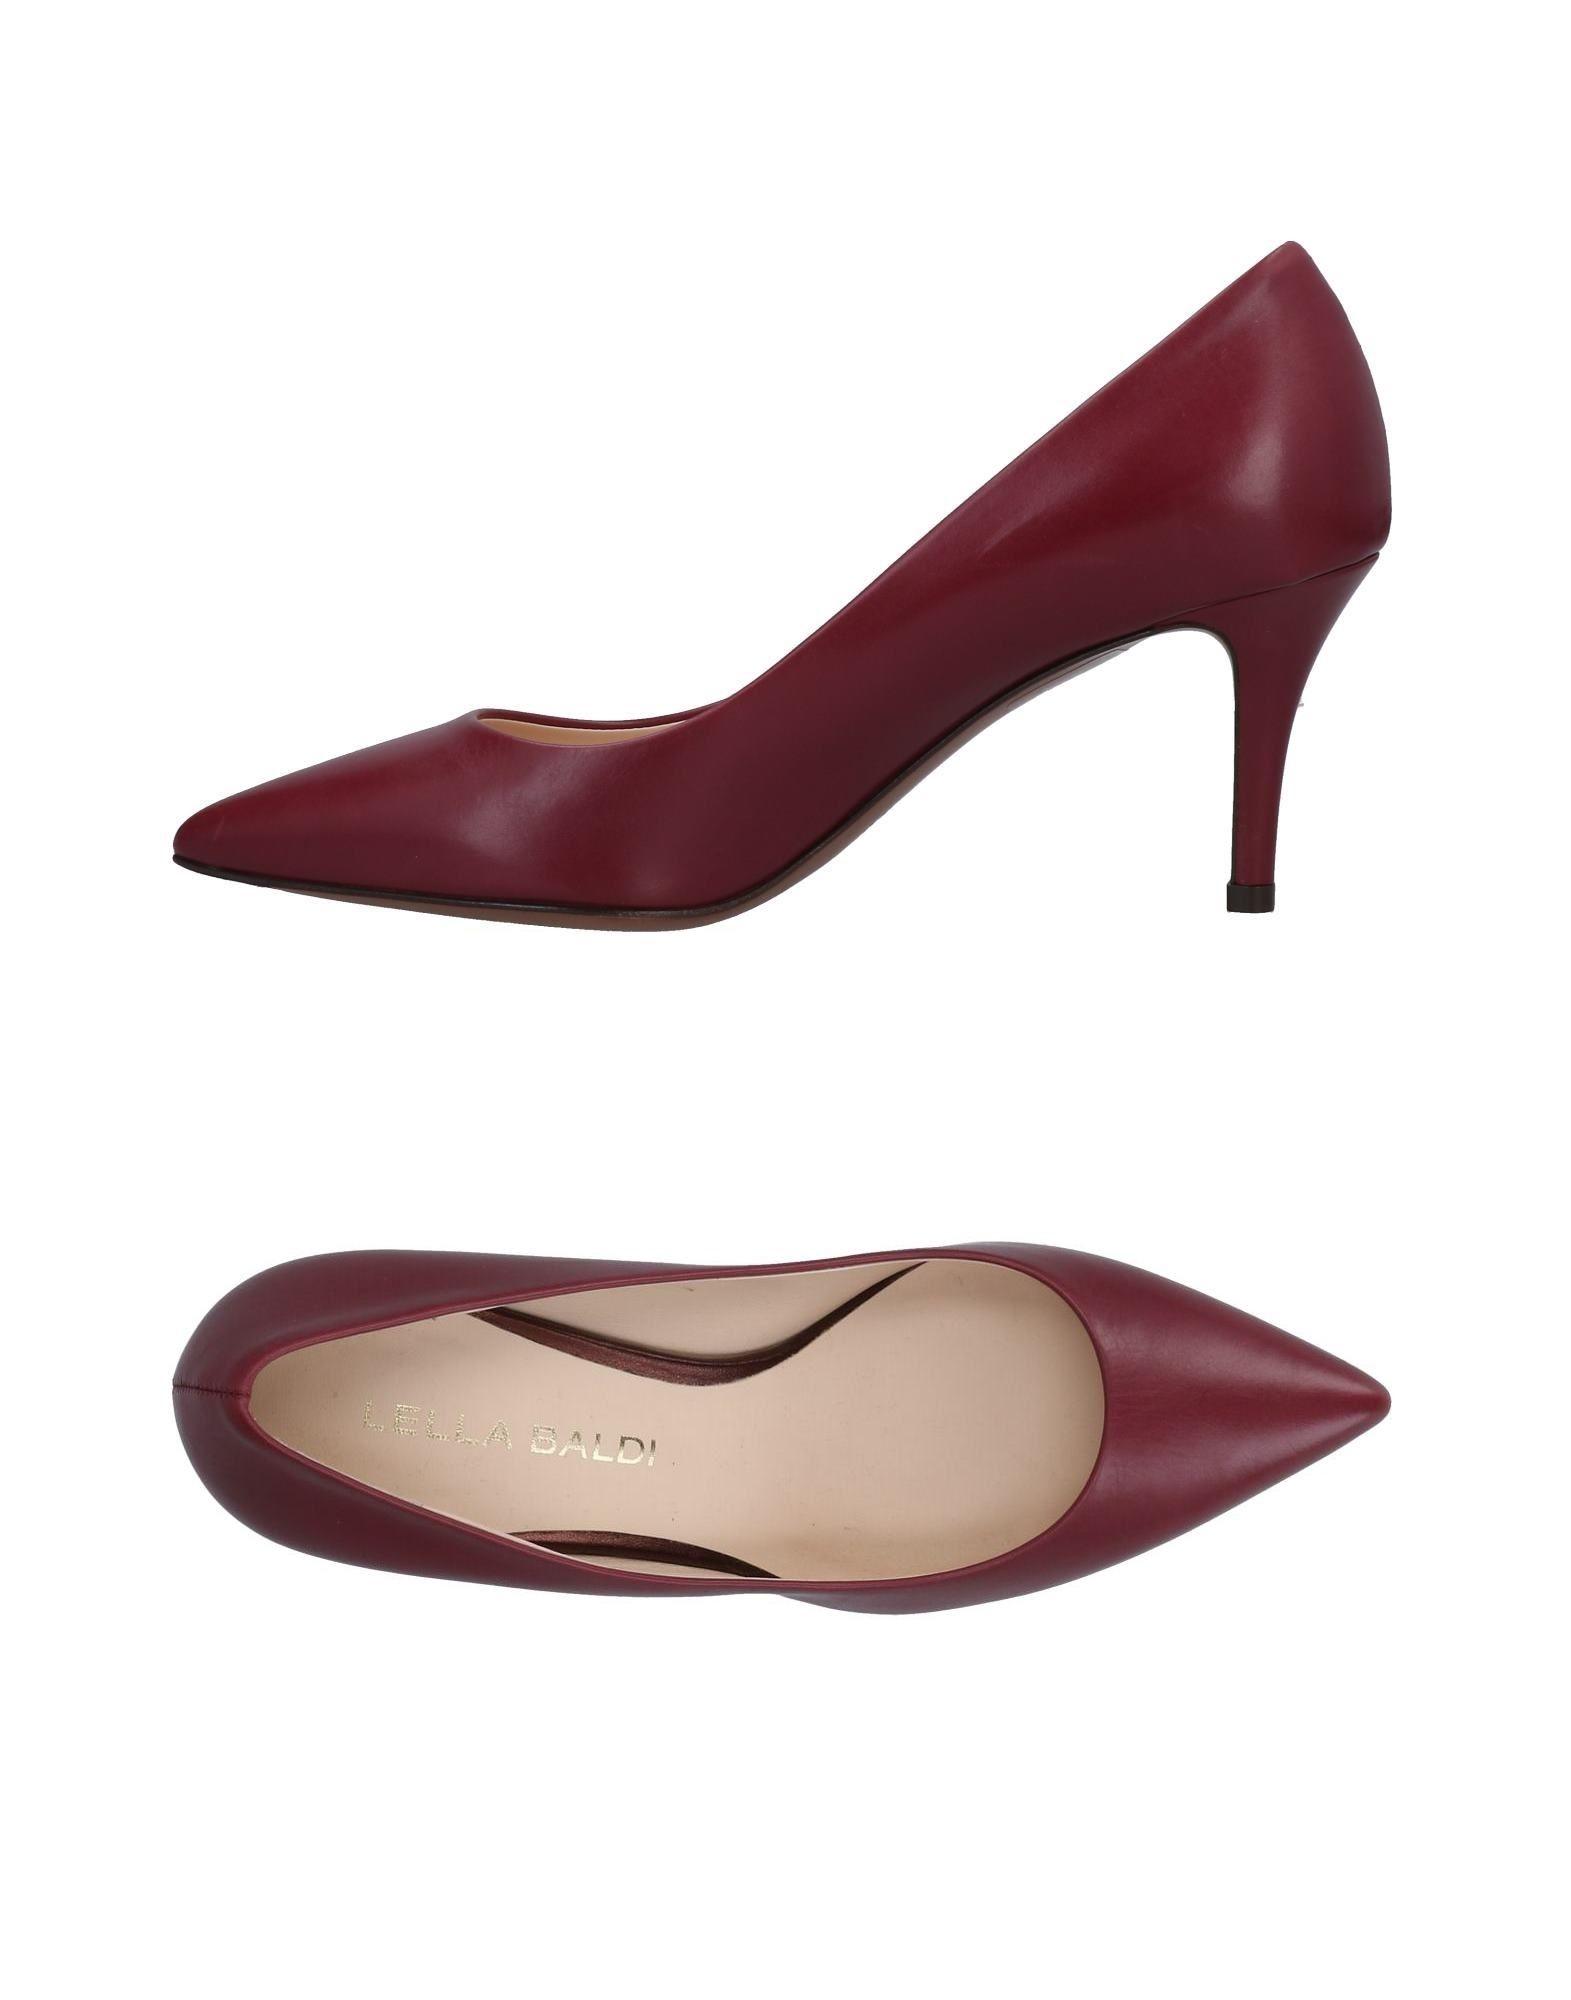 Lella Baldi Pumps Damen  11491747IB Gute Qualität beliebte Schuhe